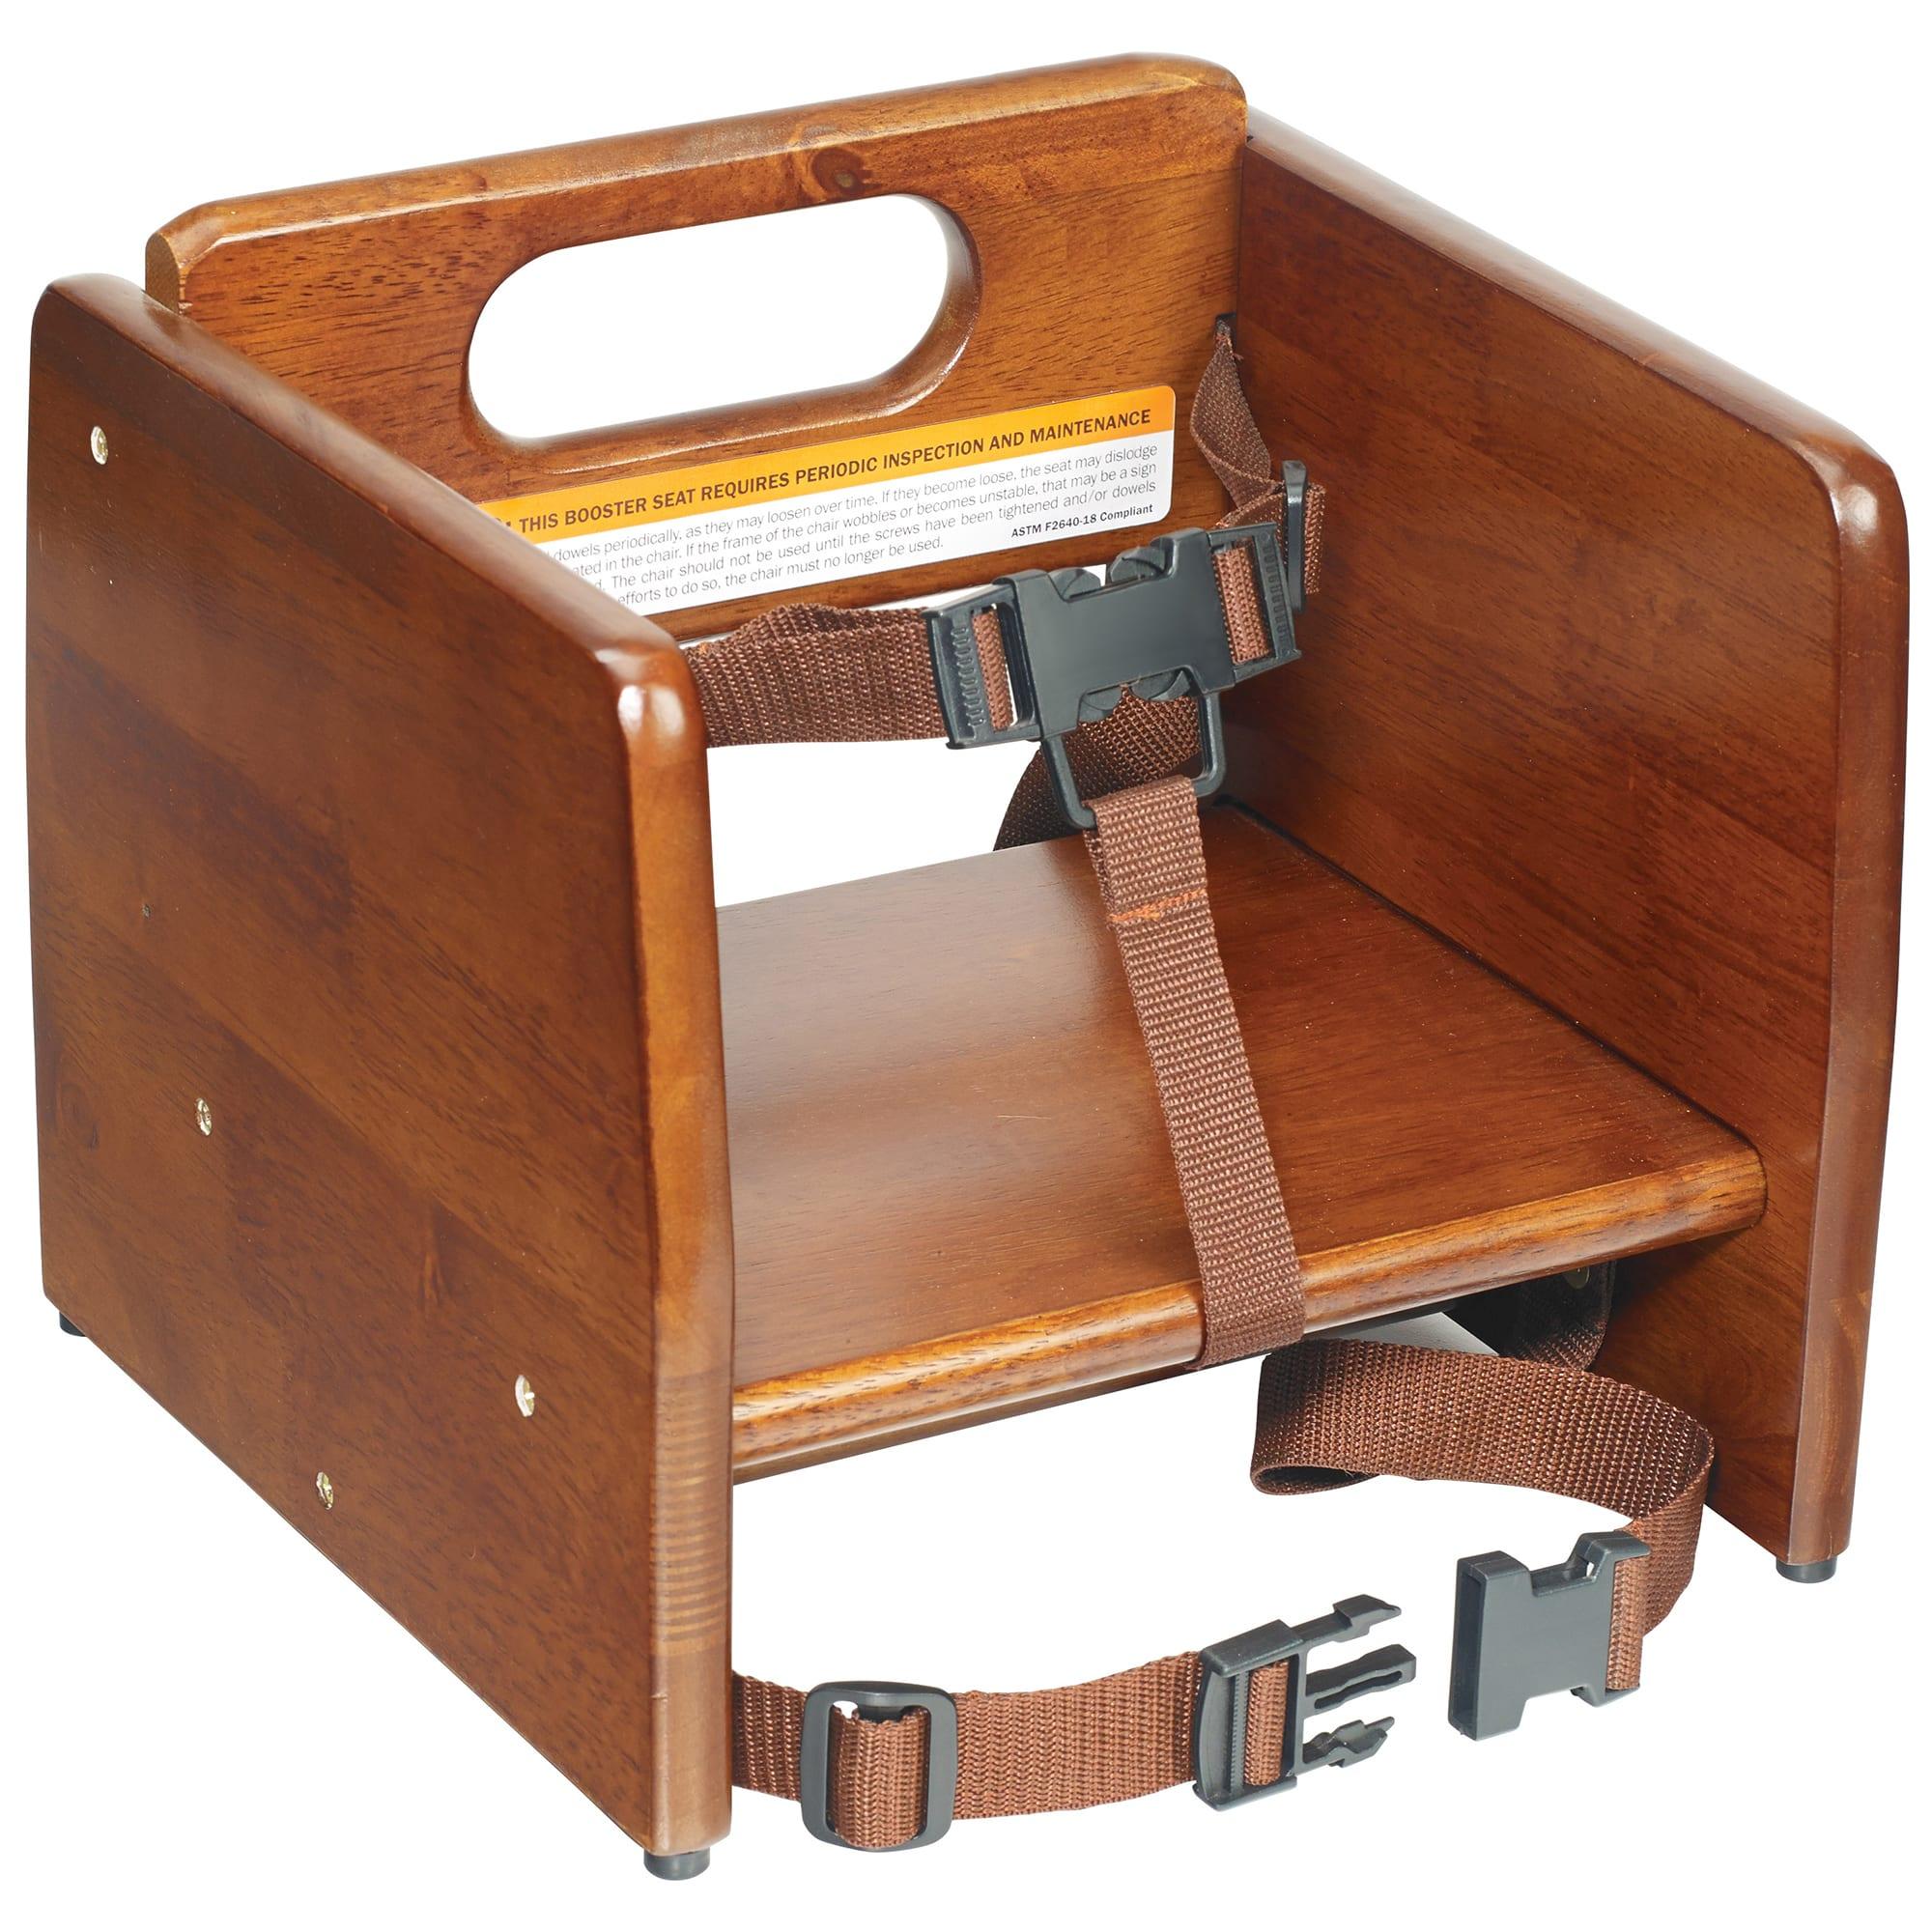 Winco CHB-704 Single-Height Booster Seat w/ Waist & Chair Strap - Wood, Walnut